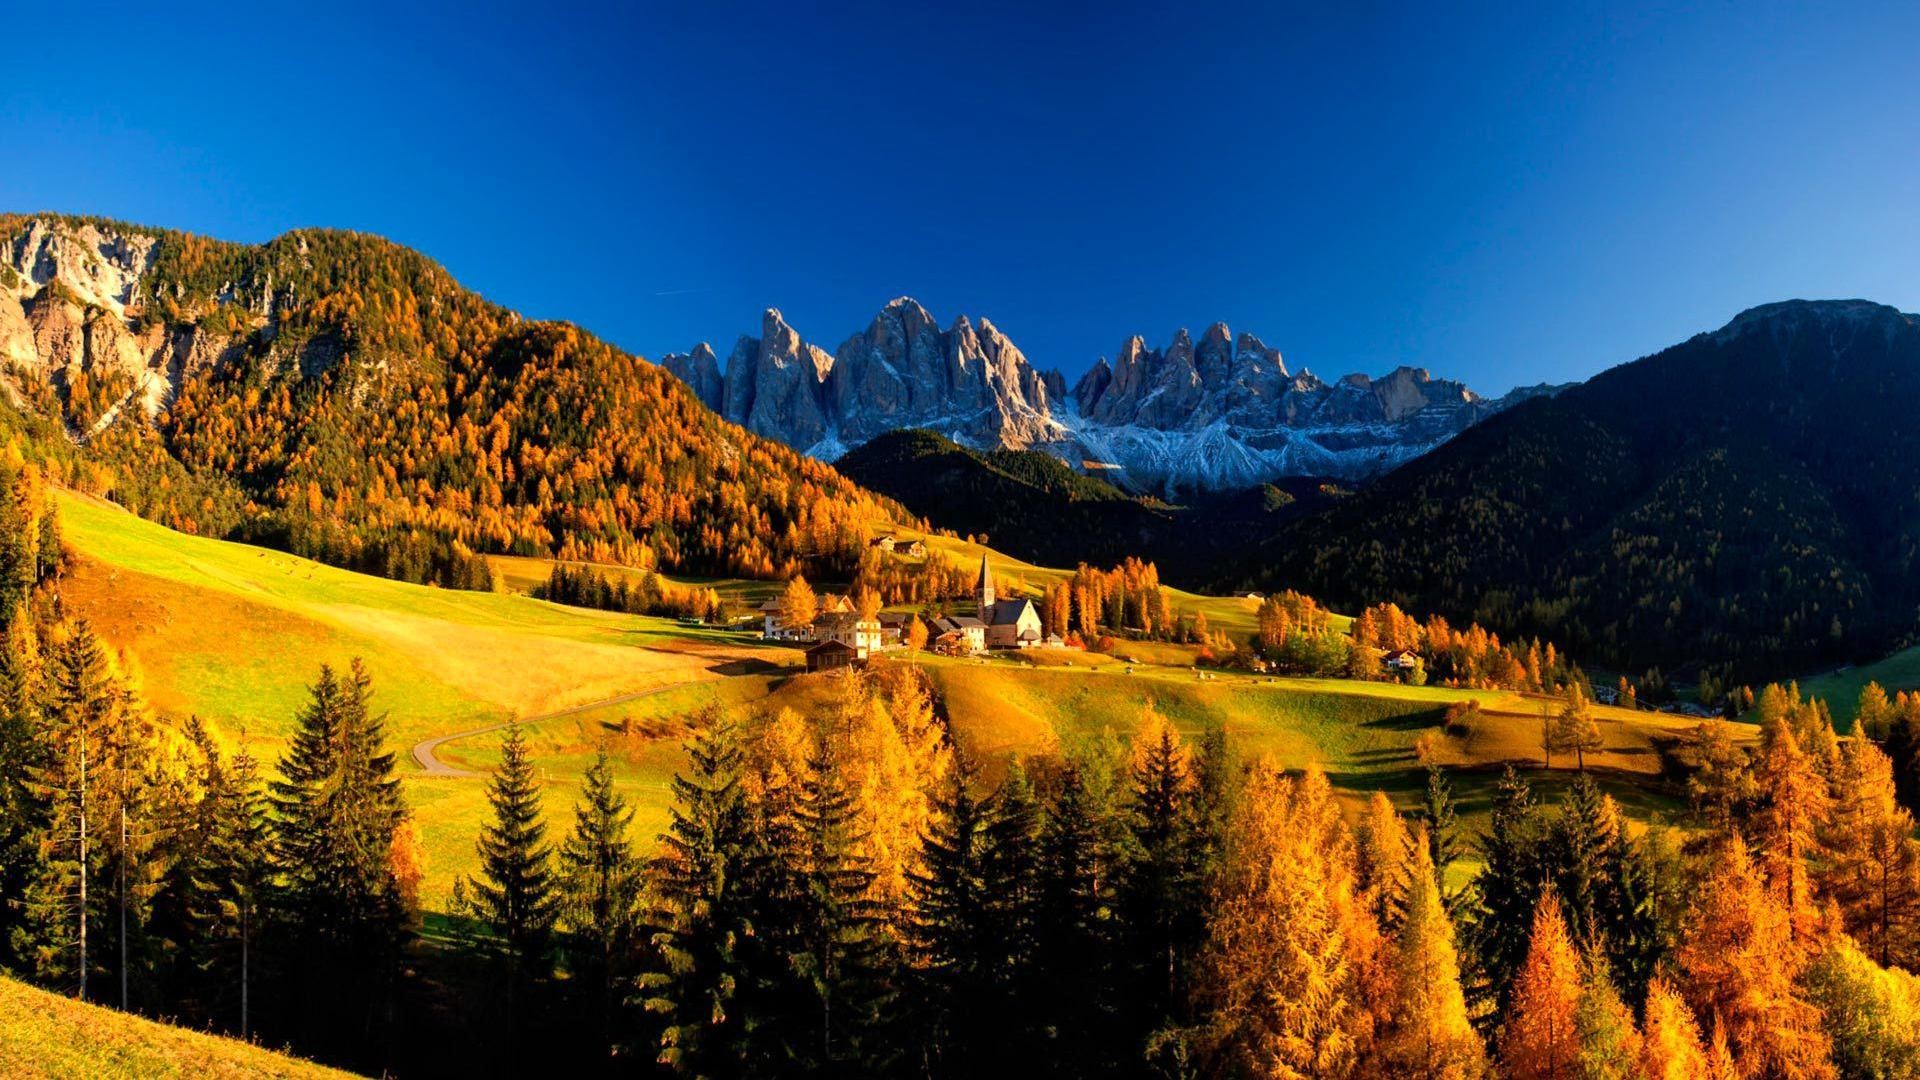 Mountain village in autumn wallpapers HD.